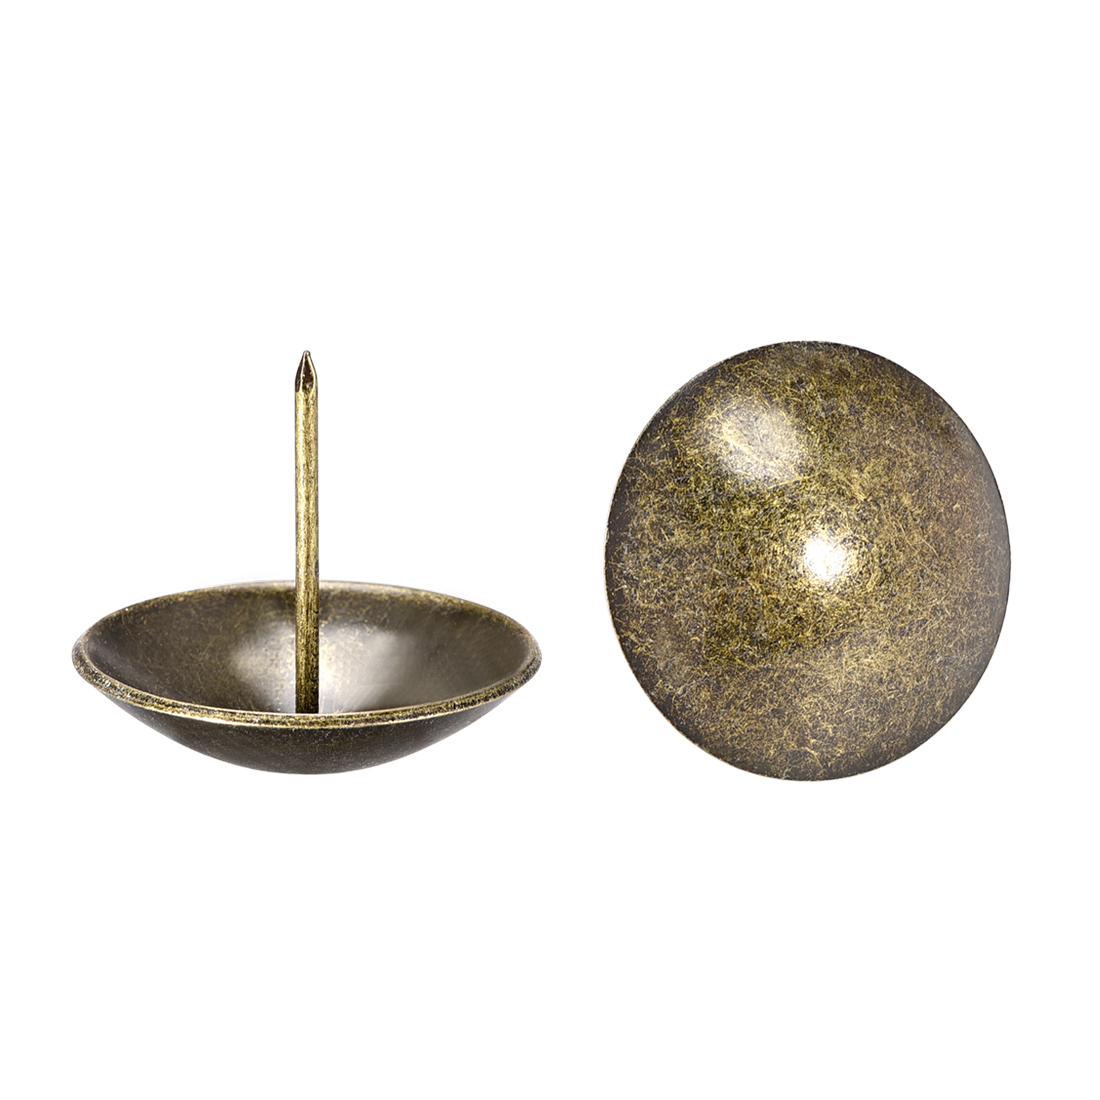 Upholstery Nails Tacks 40mm Dia 37mm Height Round Push Pins Bronze Tone 30 Pcs